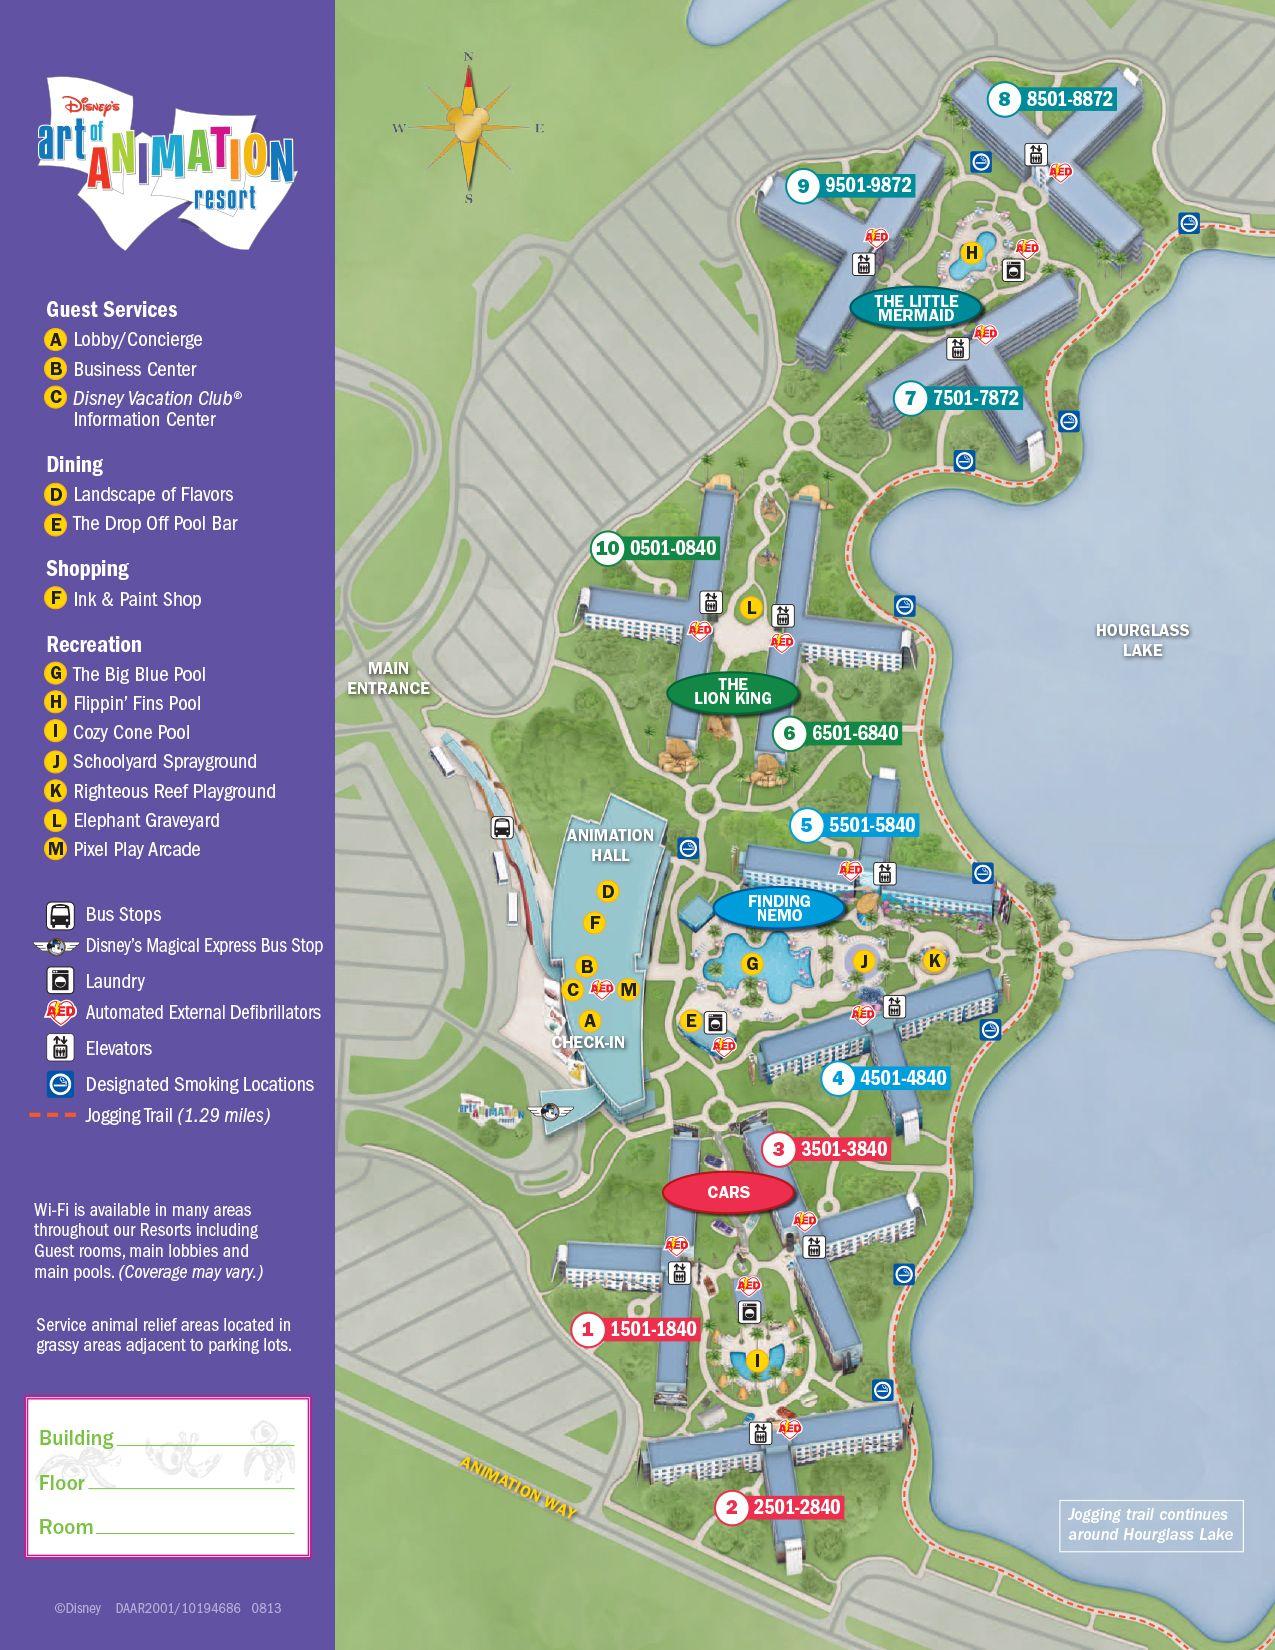 Art of Animation Resort Map   Disney World Maps   Pinterest   Disney ...